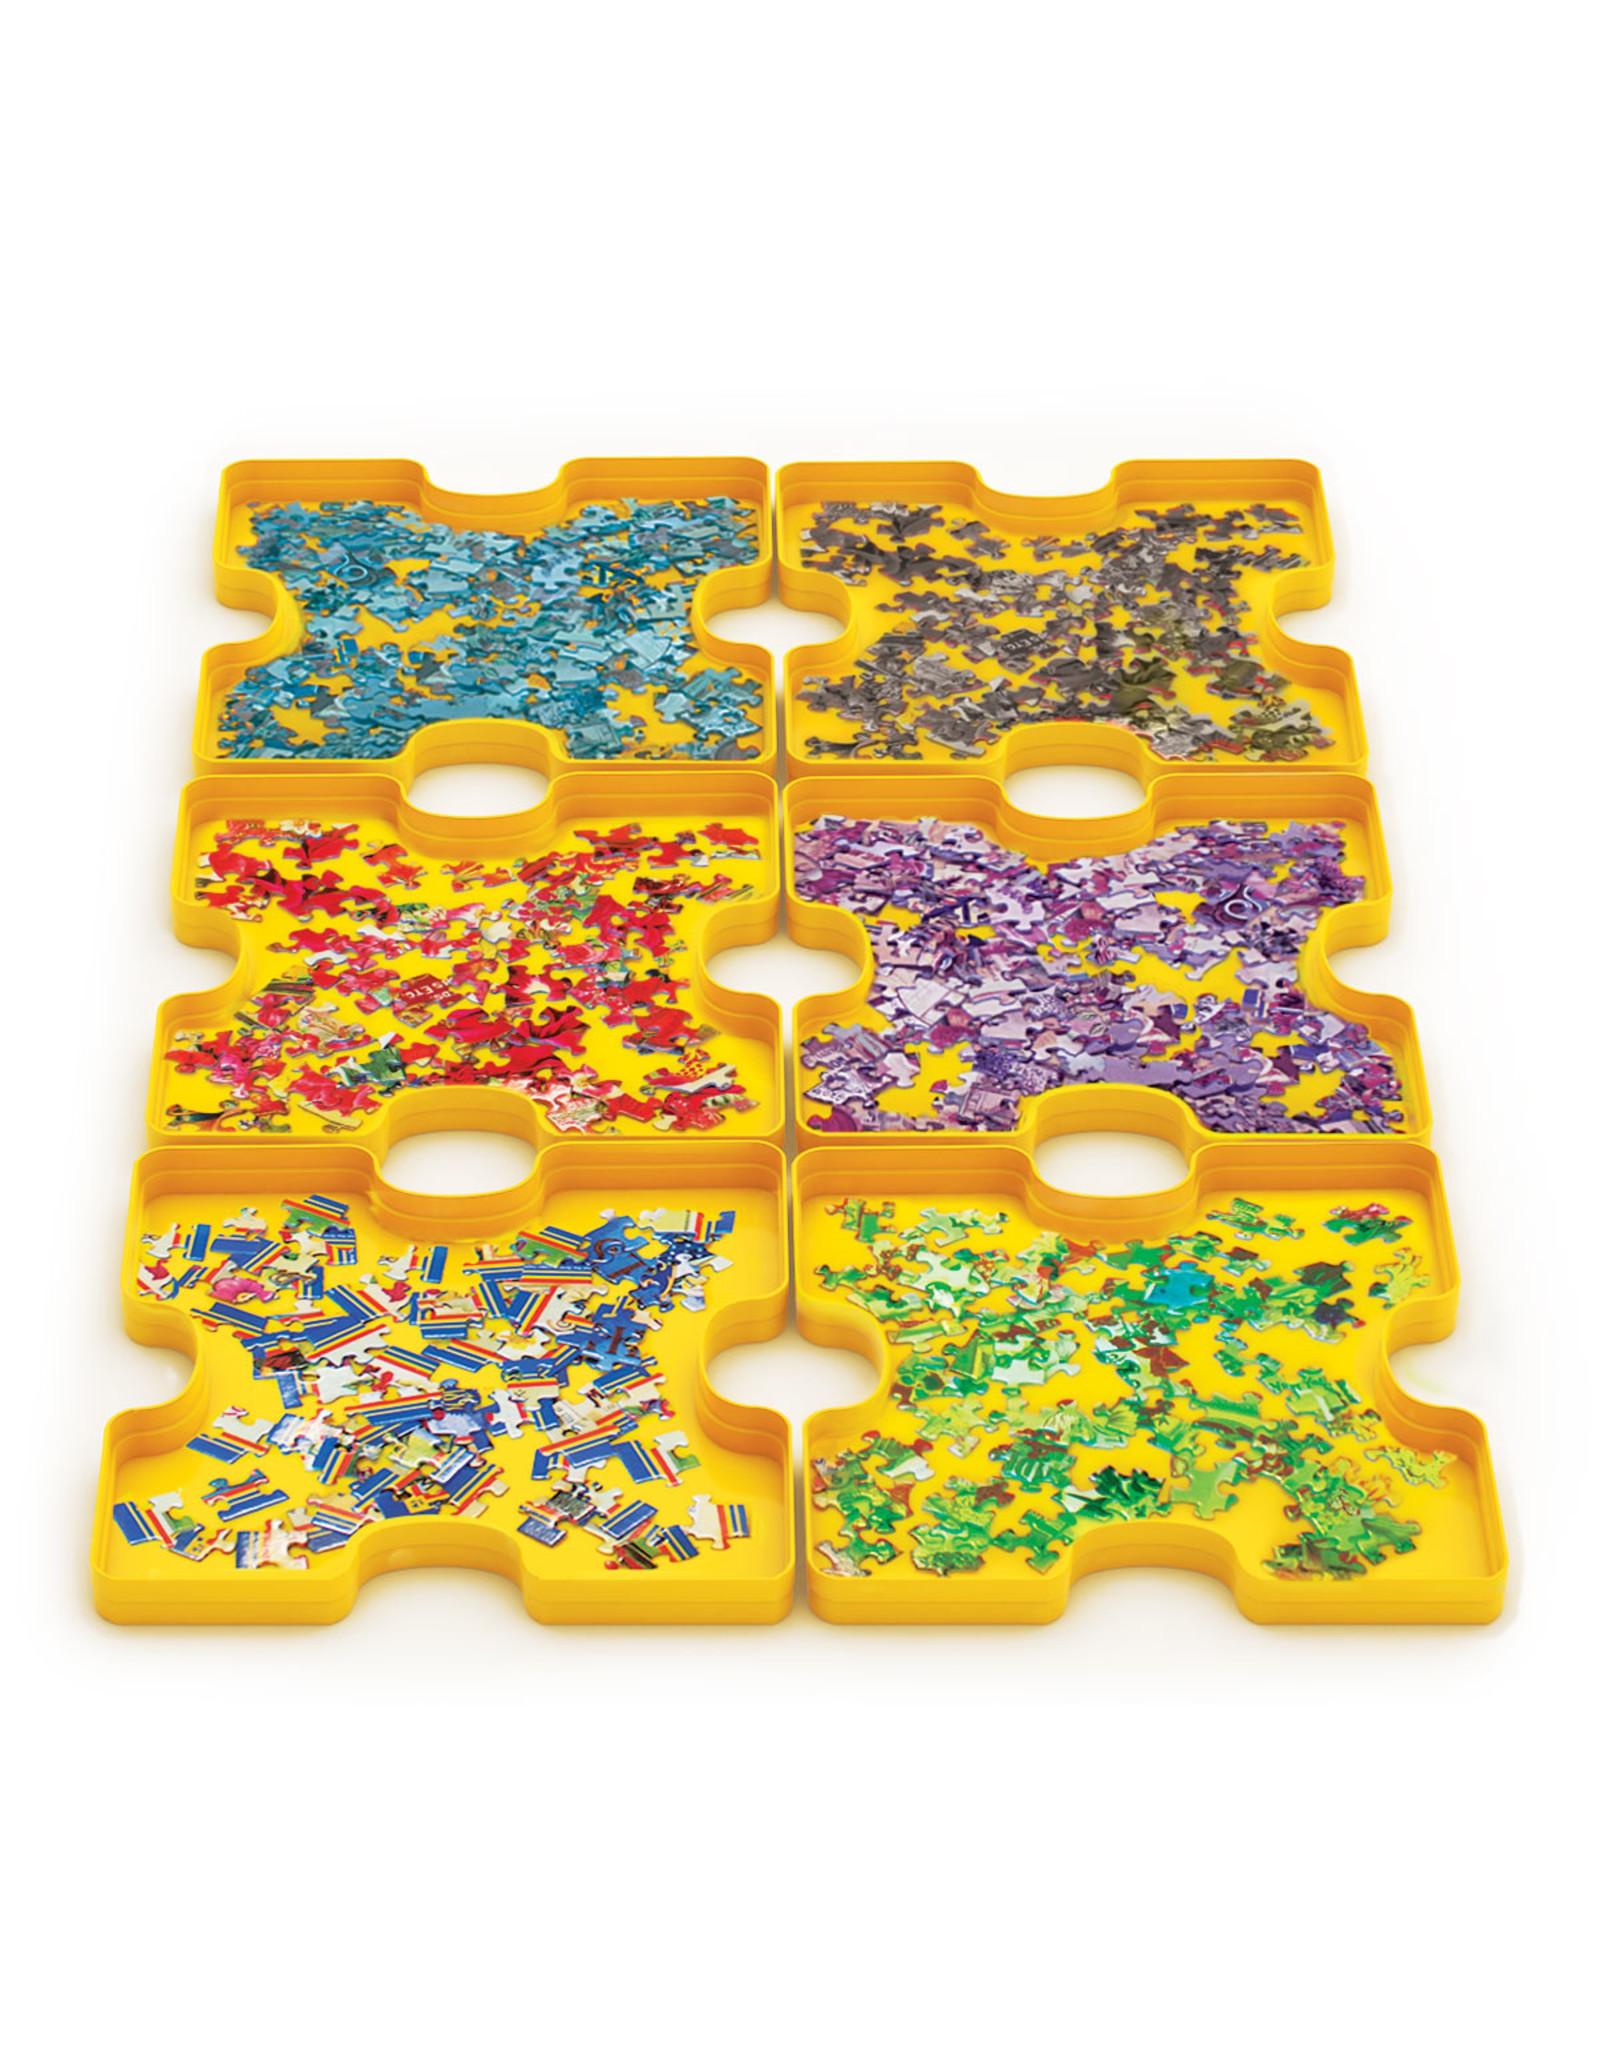 Eurographics Smart Puzzle Sort & Store